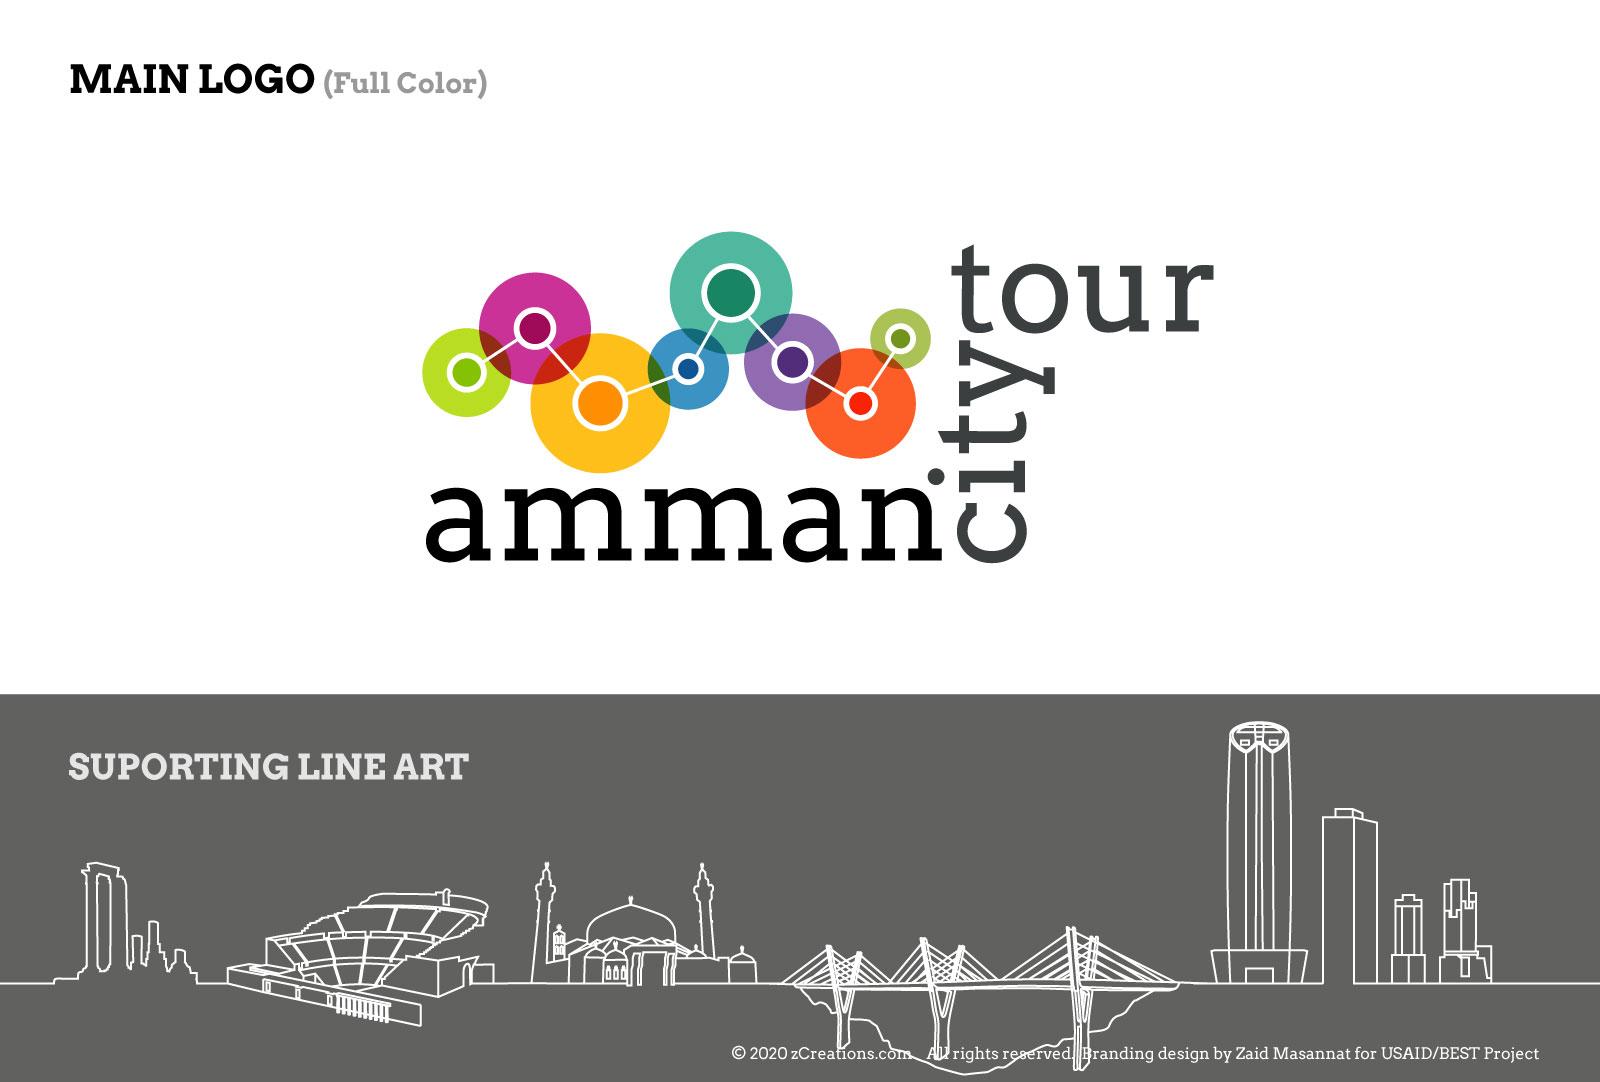 Amman City Tour branding design by Zaid Masannat - Supporting Line Art